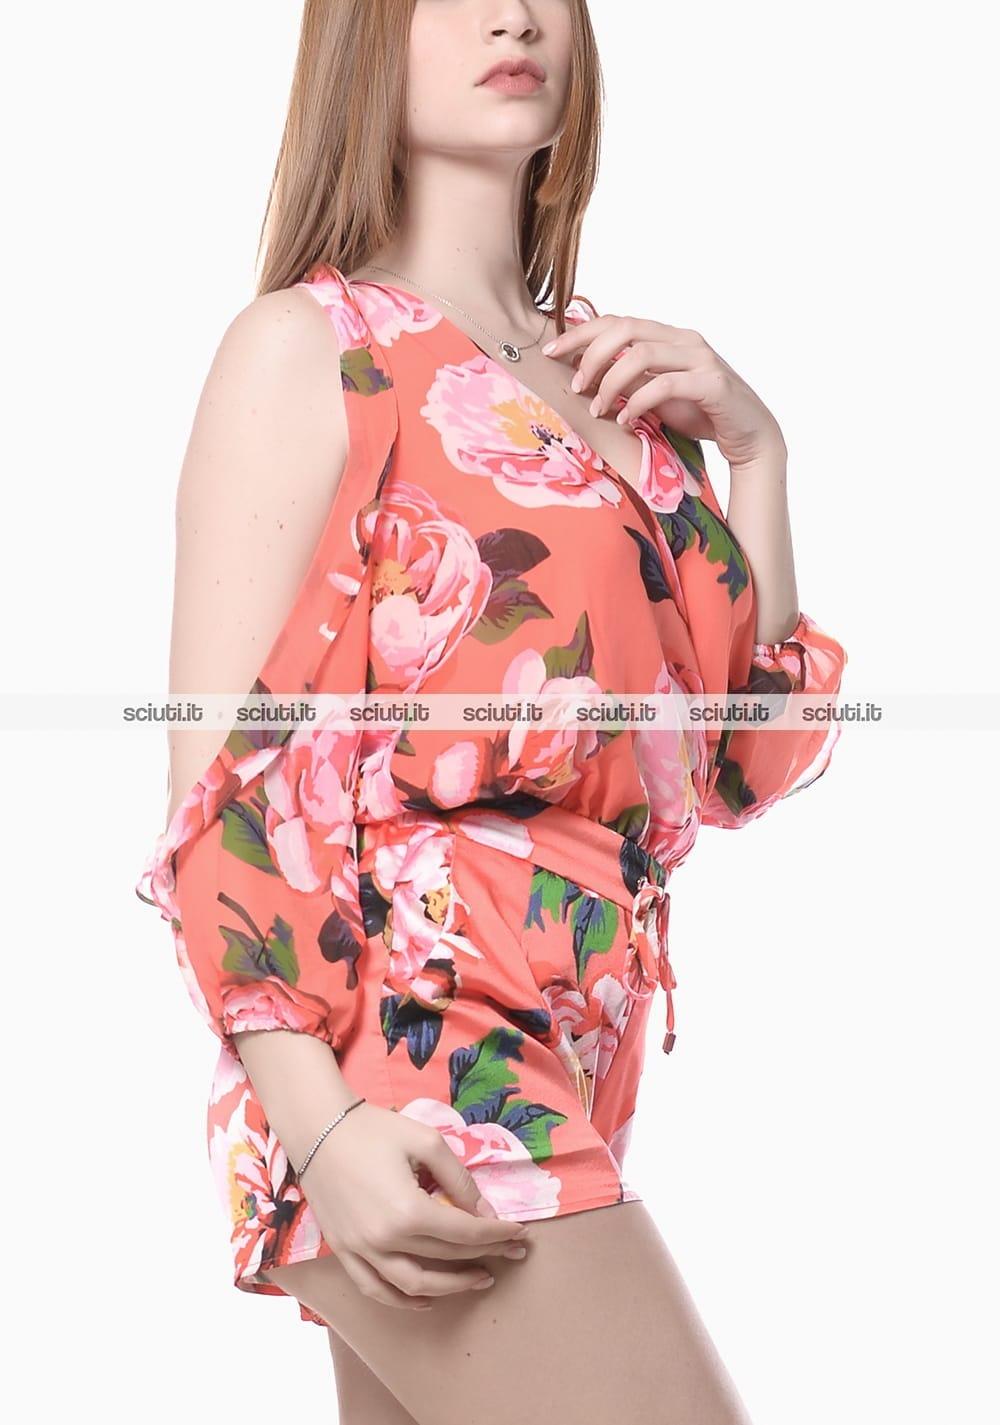 34d1c4c21d Abito tuta Guess Marciano donna fantasia floreale arancione